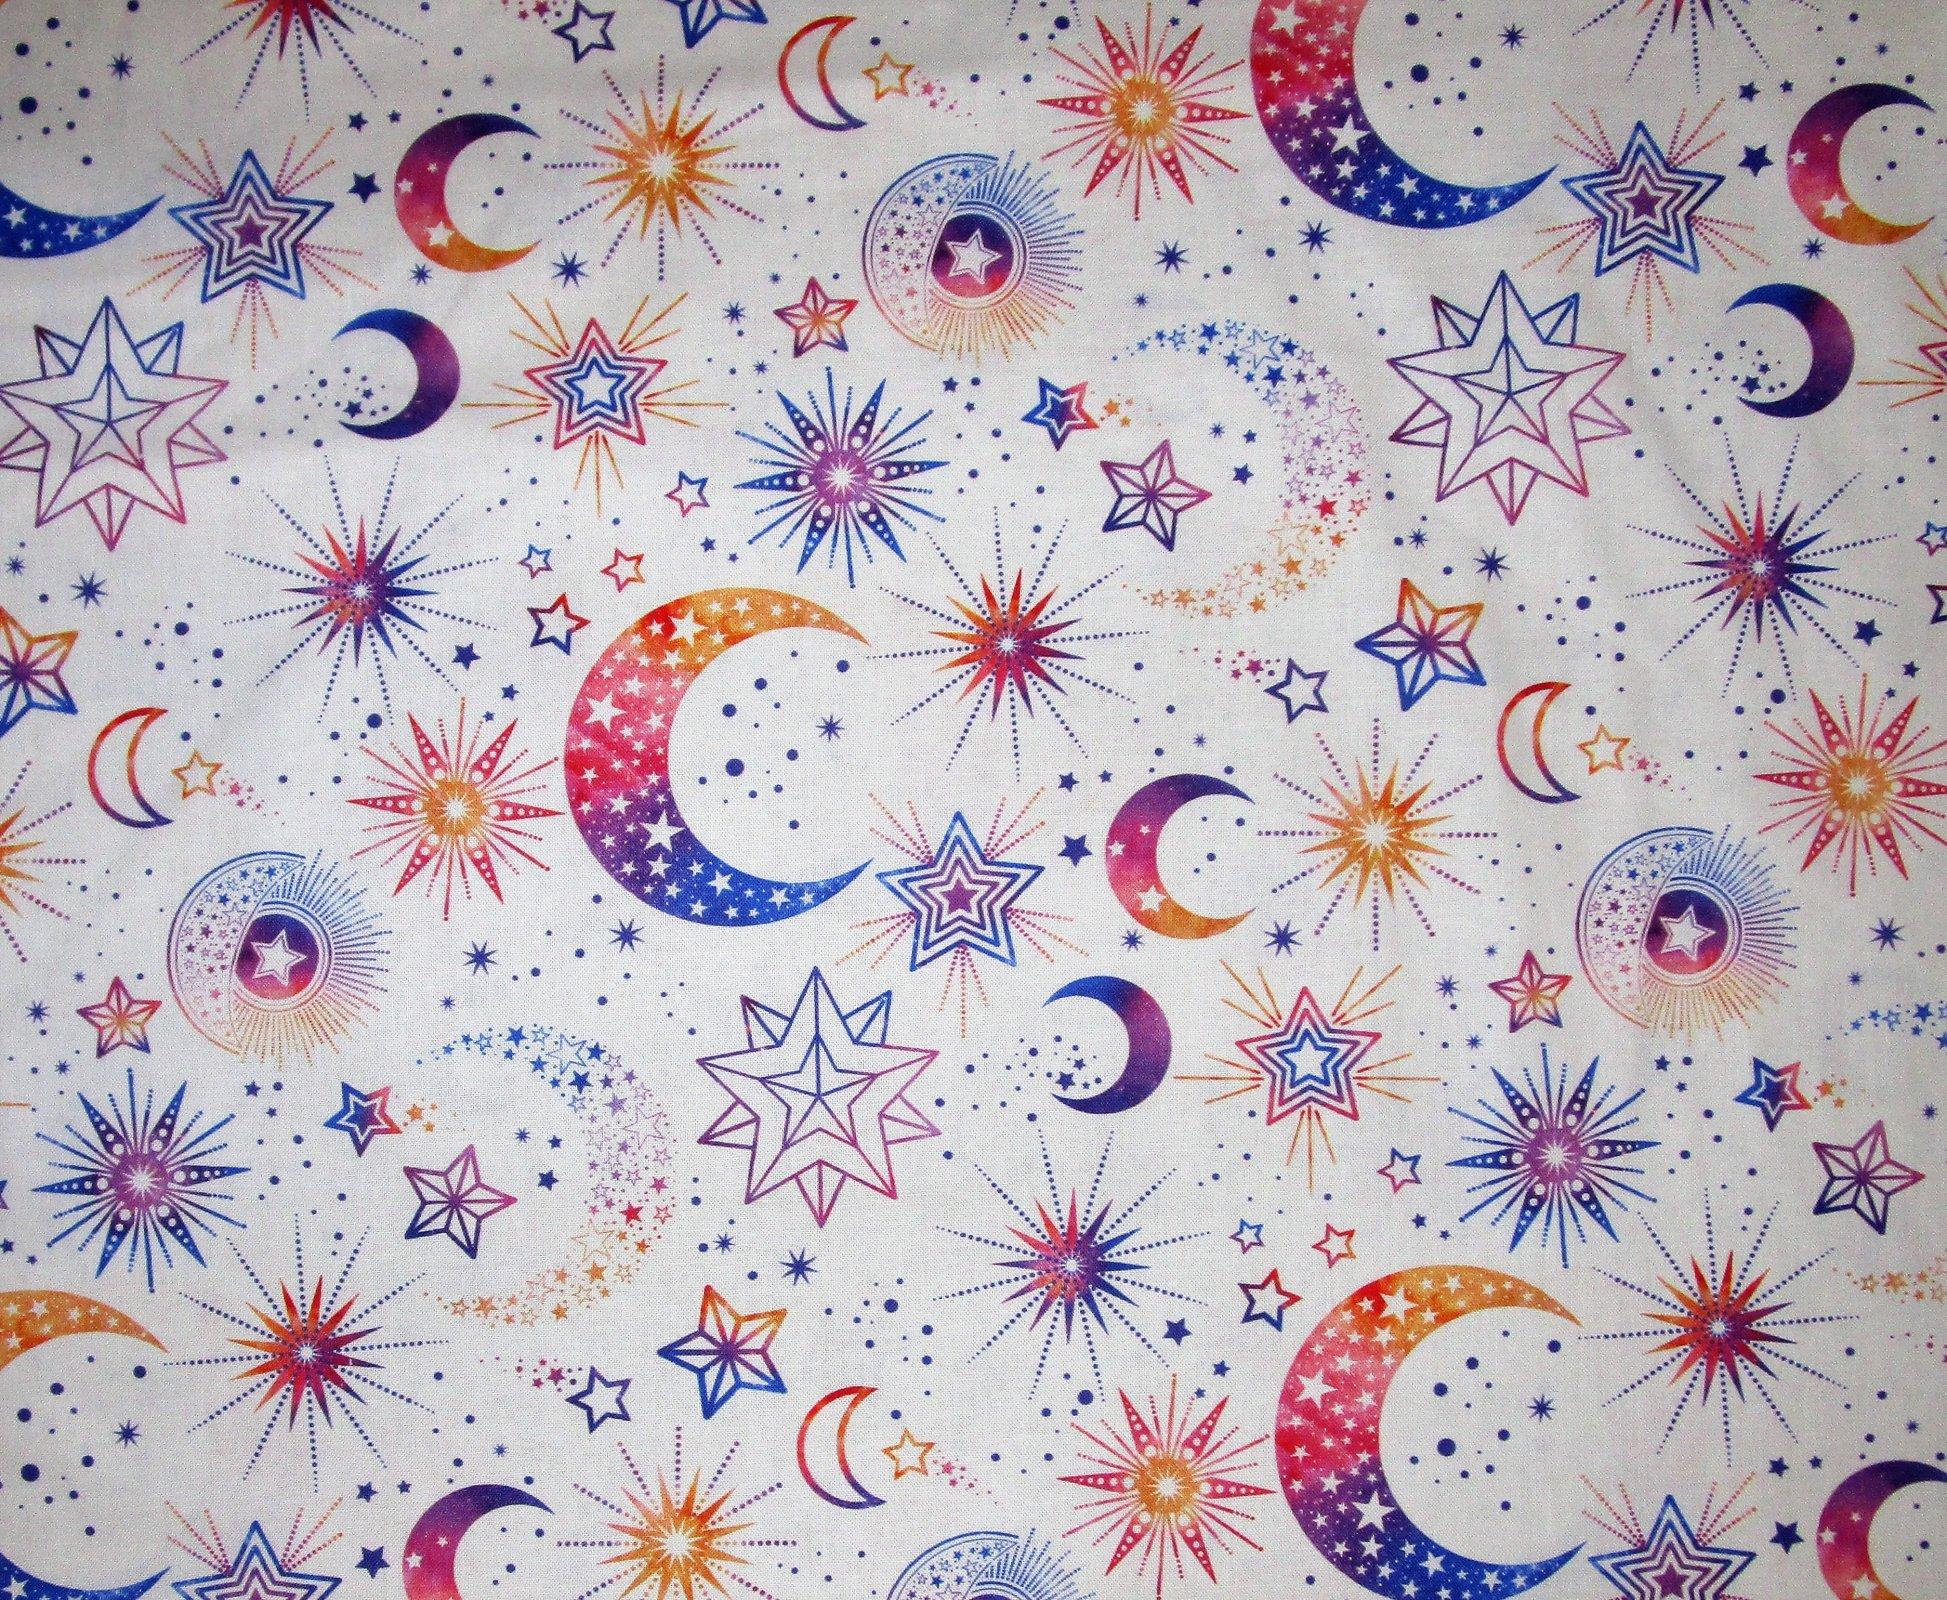 Cosmic Universe 22718-87 White/Purple/Orange Moons